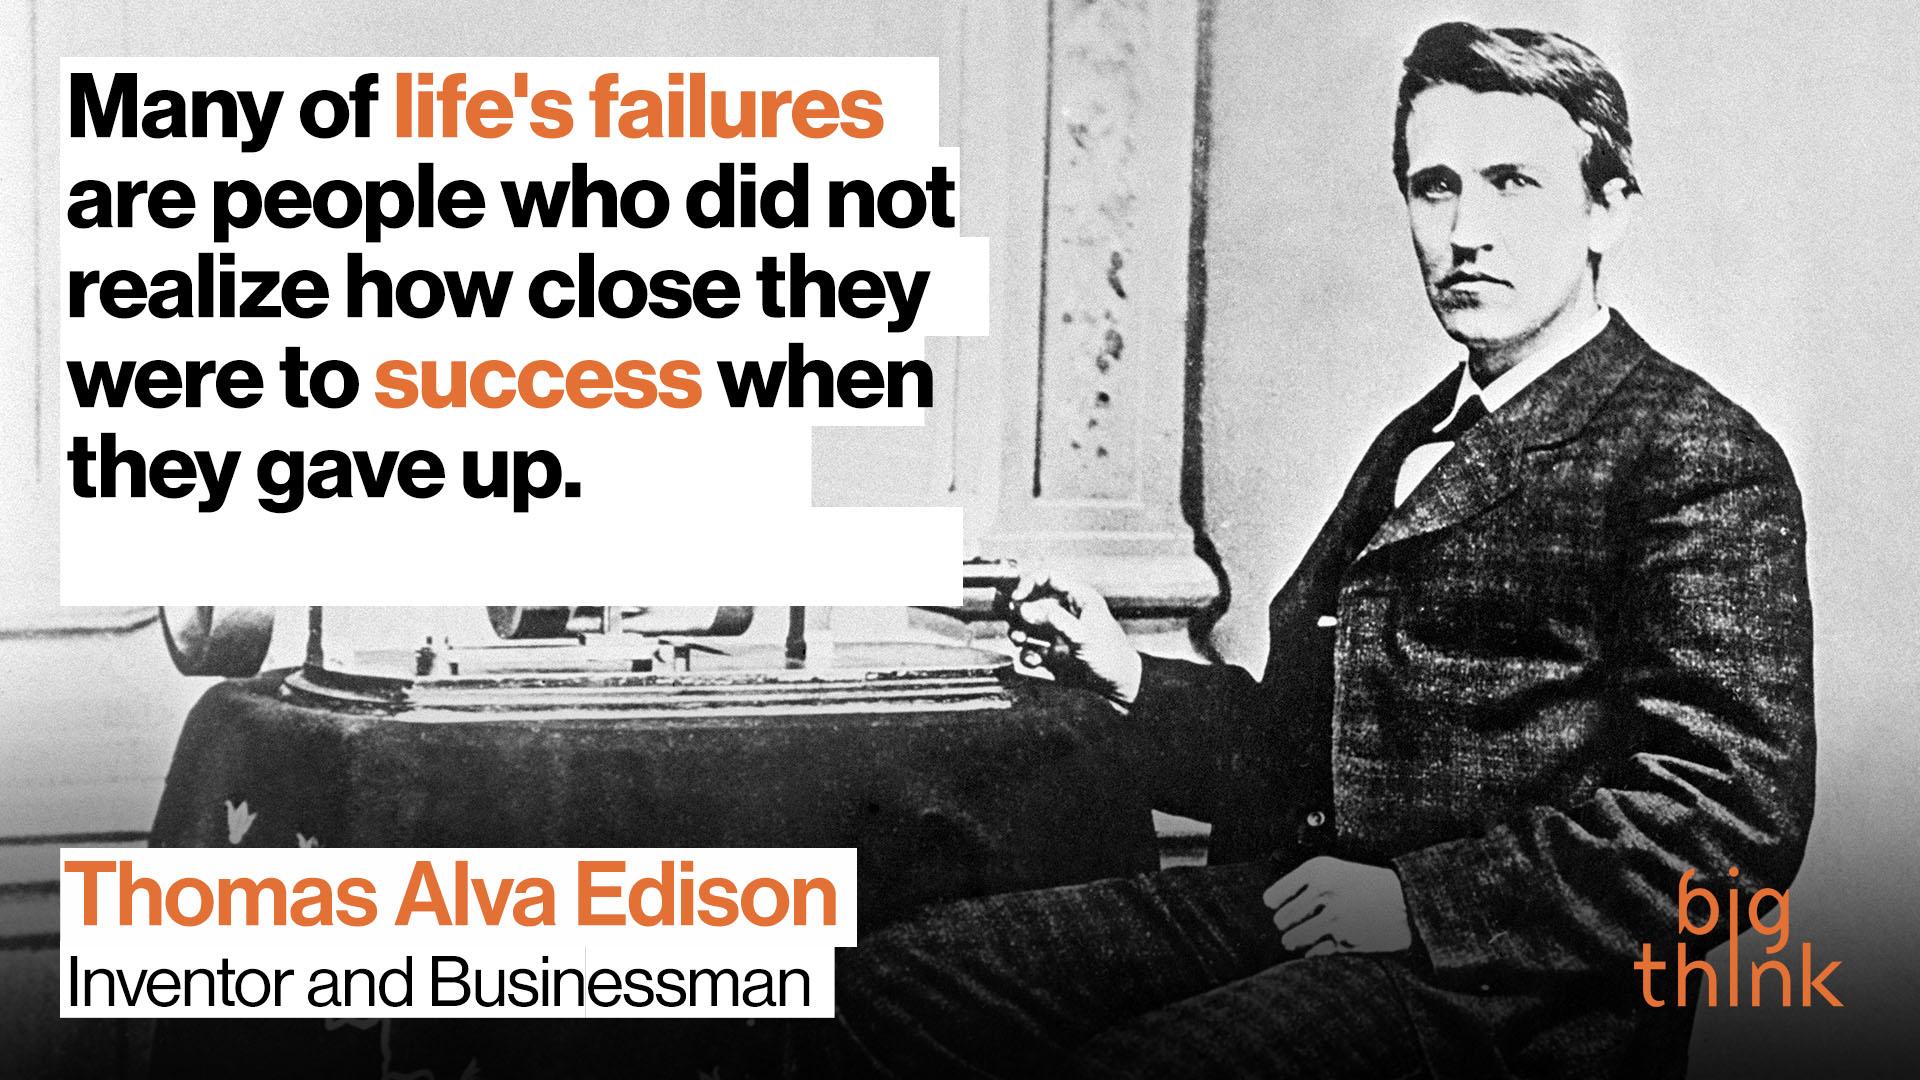 Happy birthday, Thomas Edison! The Wizard of Menlo Park was a #BigThinker https://t.co/Gi1KSOfAlr